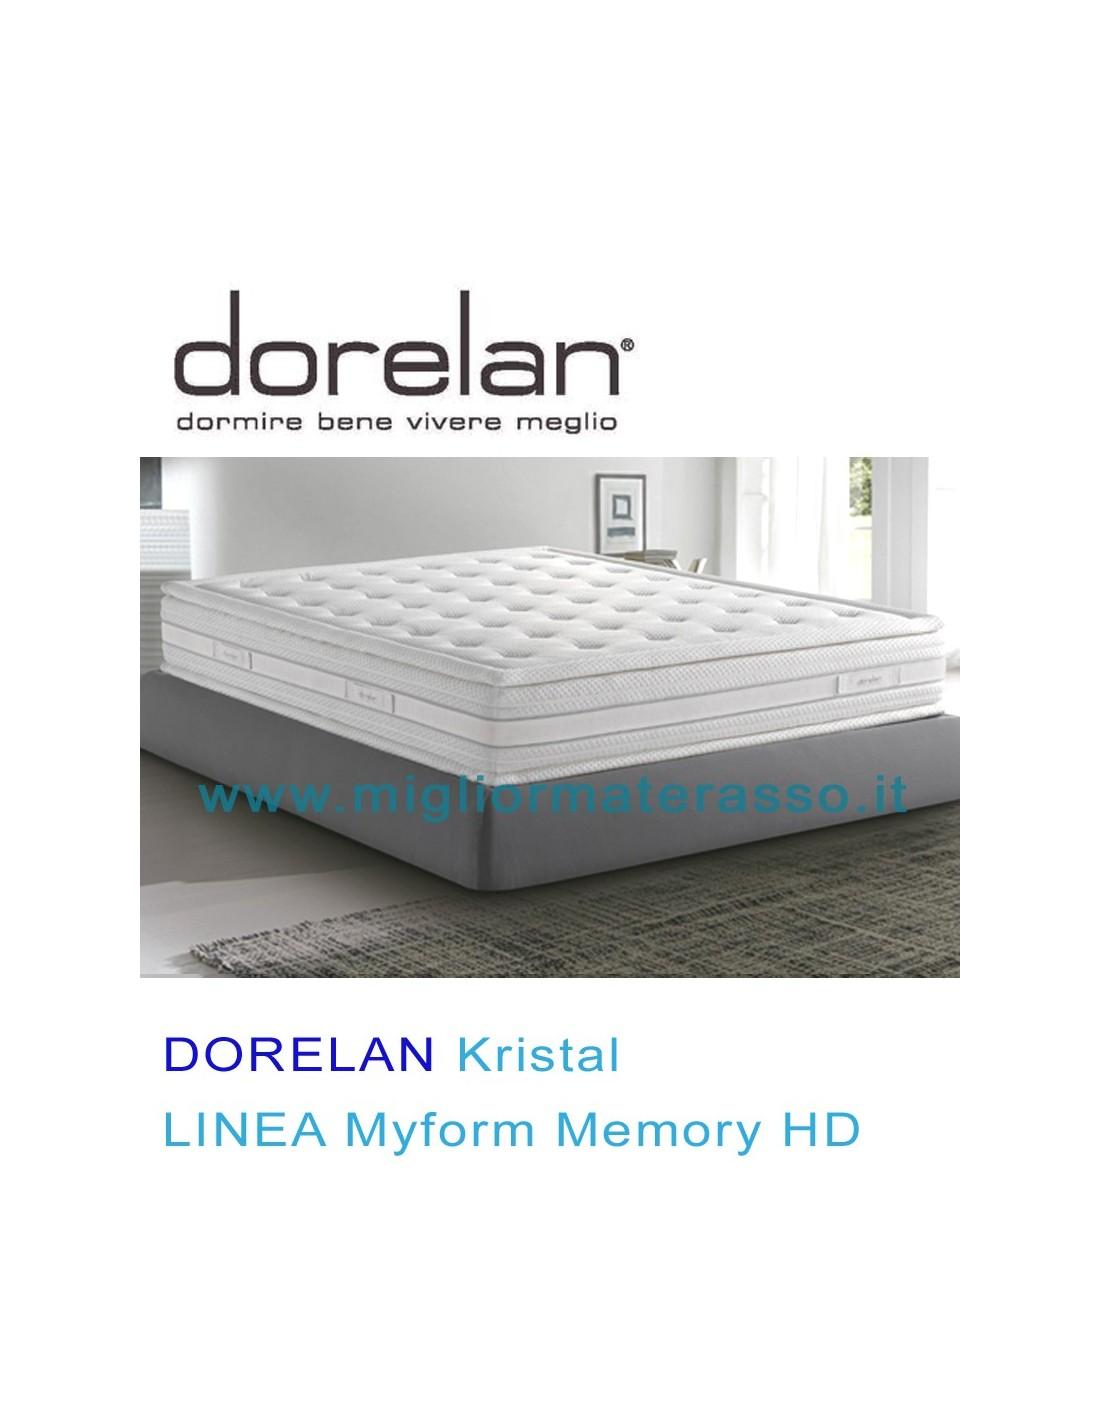 Kristal cs Myform Dorelan Memory HD Myform progress mattress